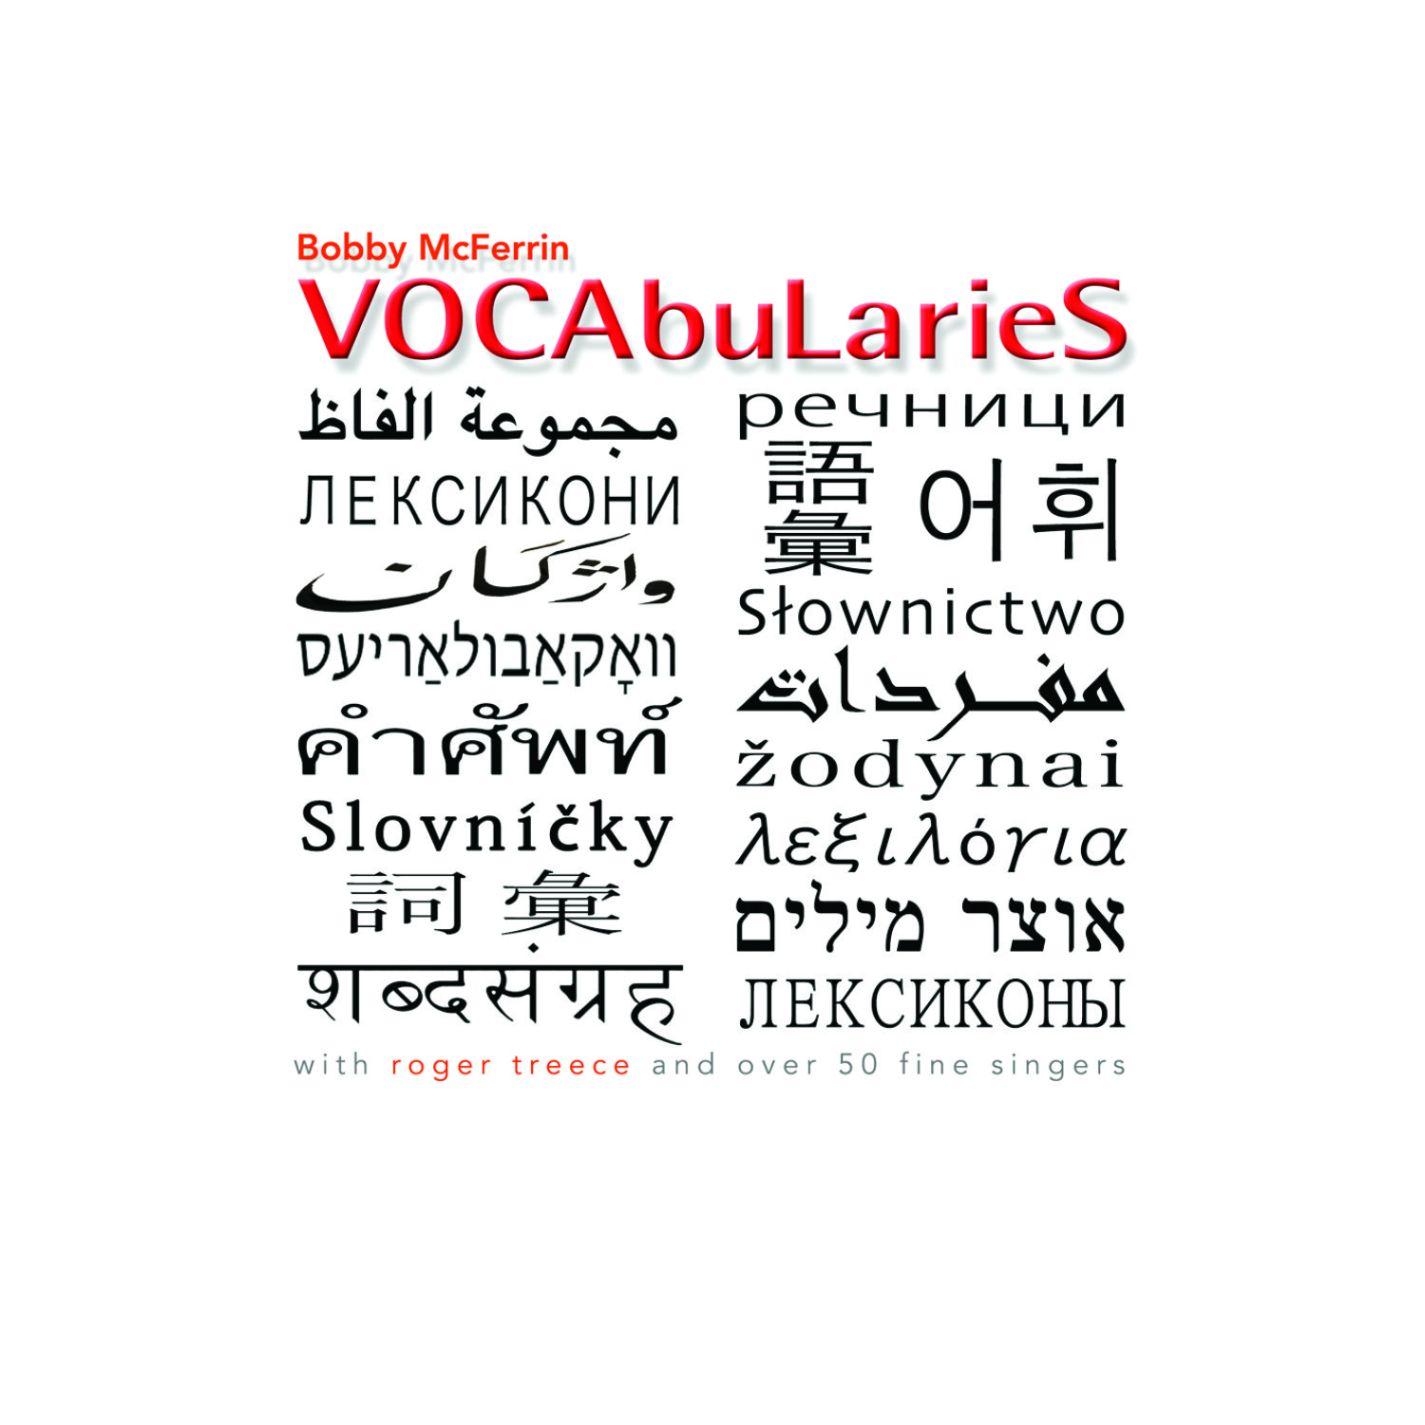 VOCAbuLaries, zdroj: Universal Music